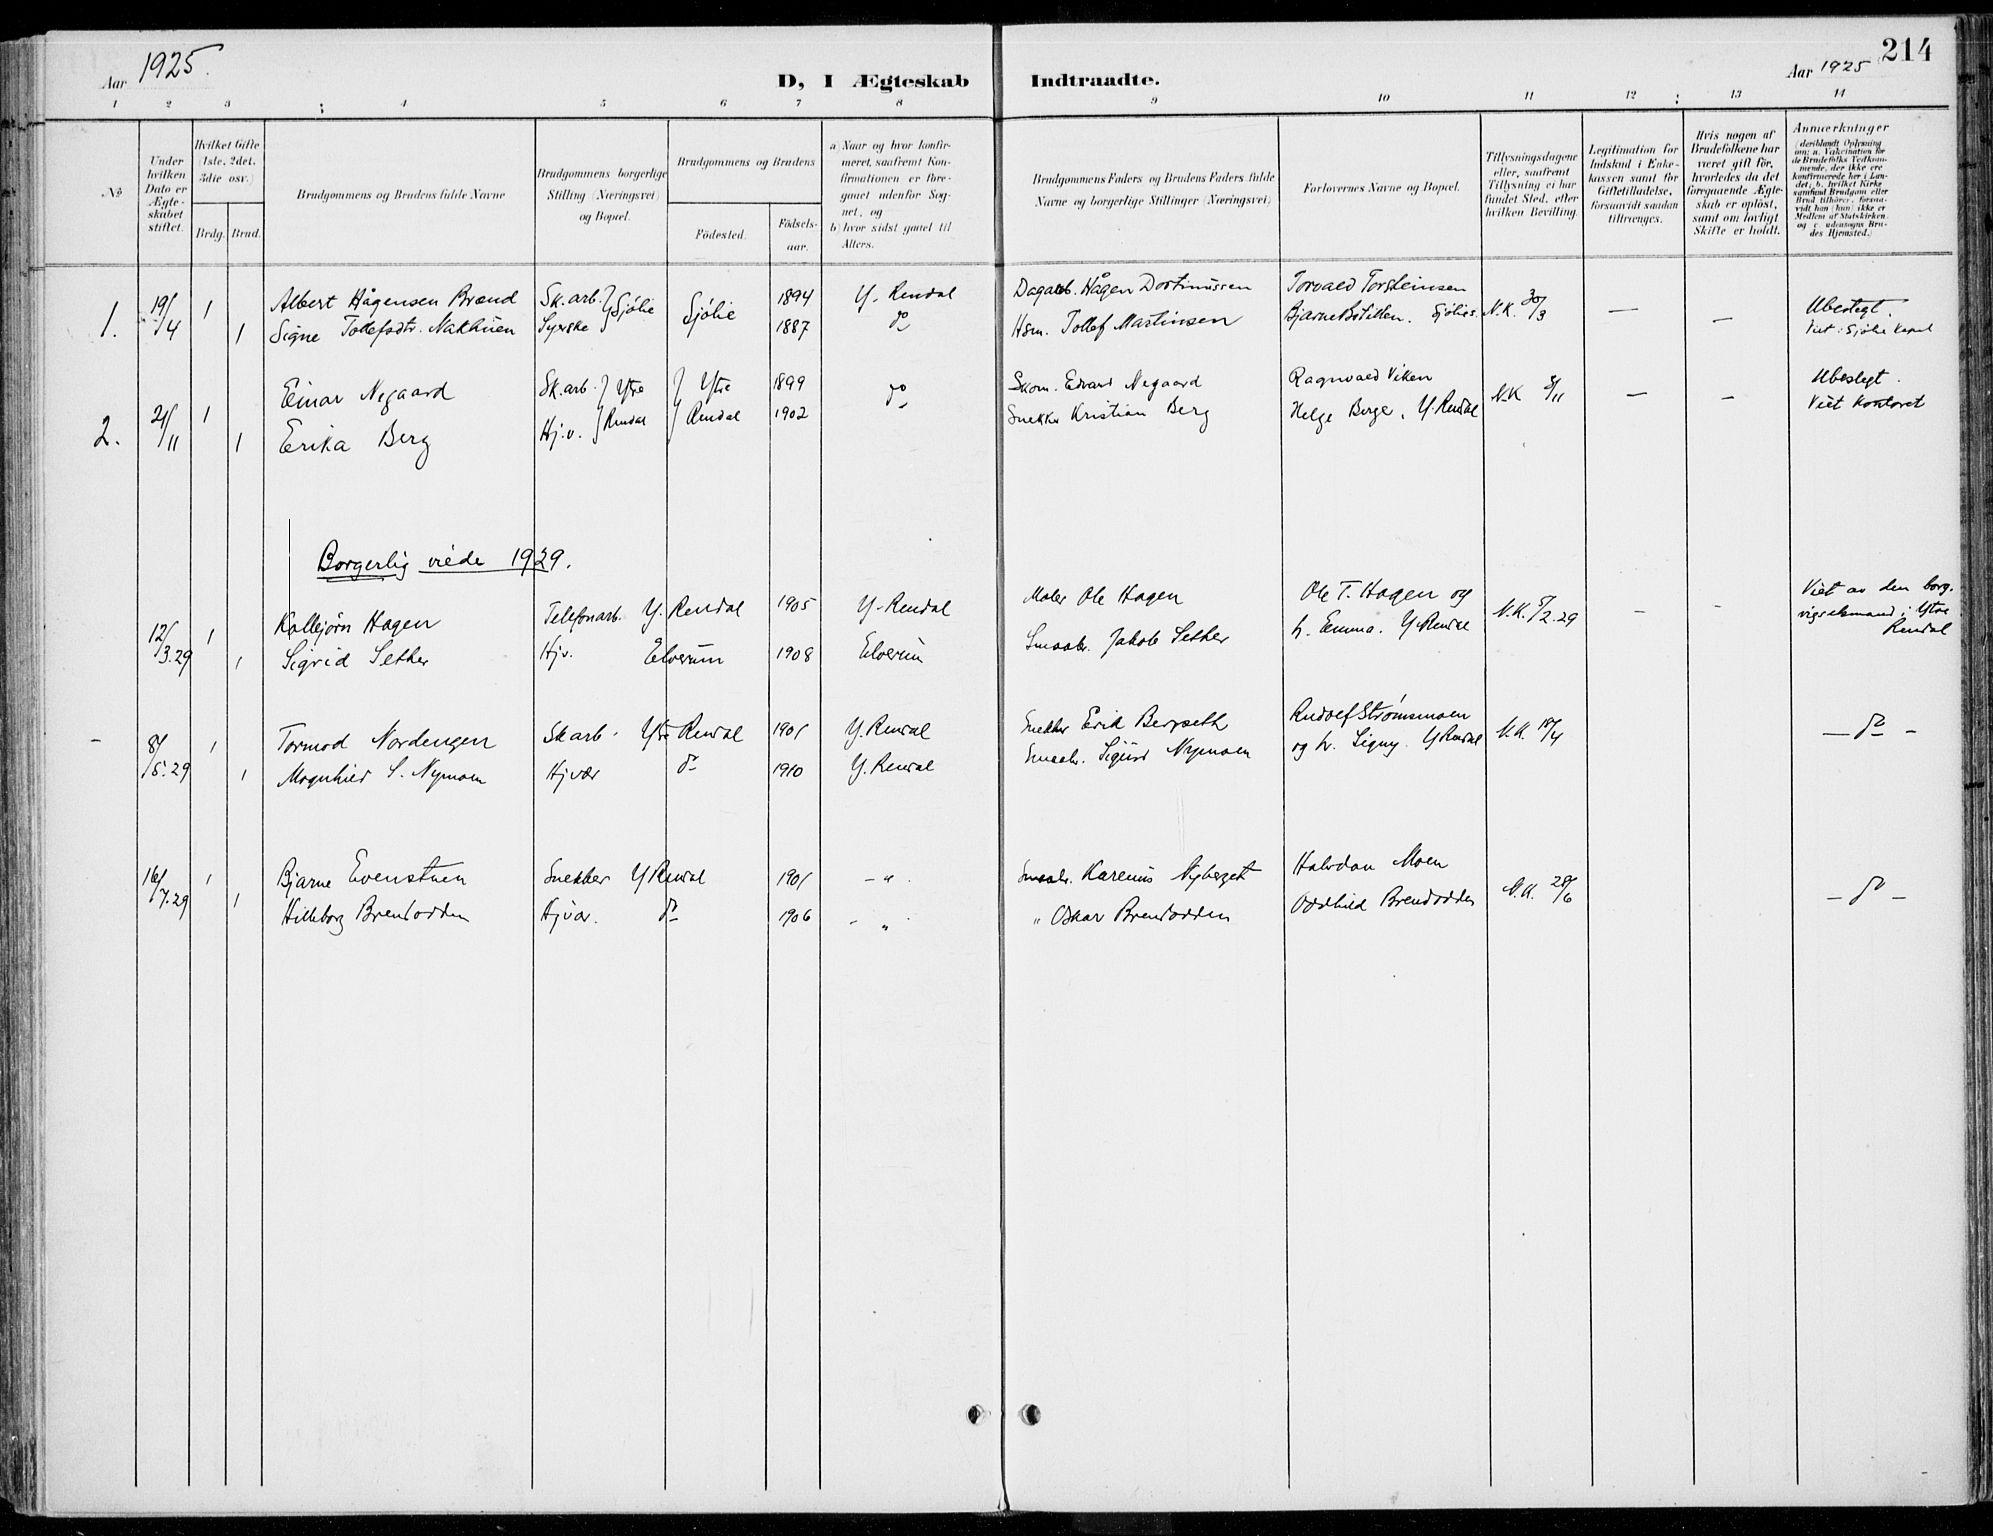 SAH, Rendalen prestekontor, H/Ha/Haa/L0011: Ministerialbok nr. 11, 1901-1925, s. 214